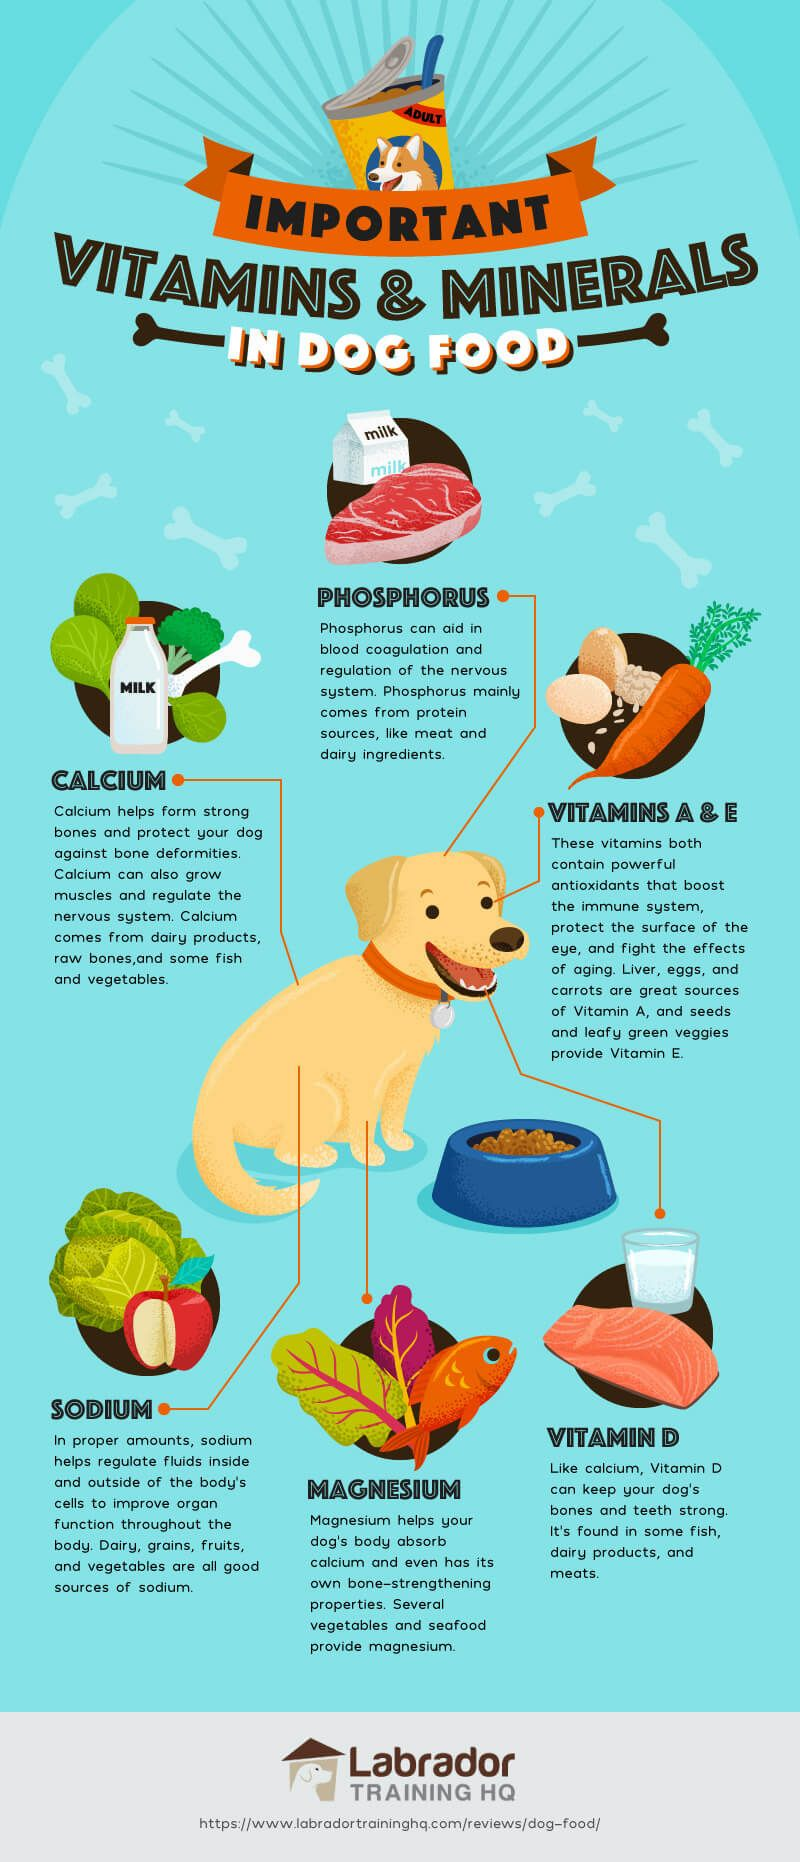 Best Dog Foods Our Complete Guide For 2020 Best Dog Food Dog Food Recipes Dog Care Tips